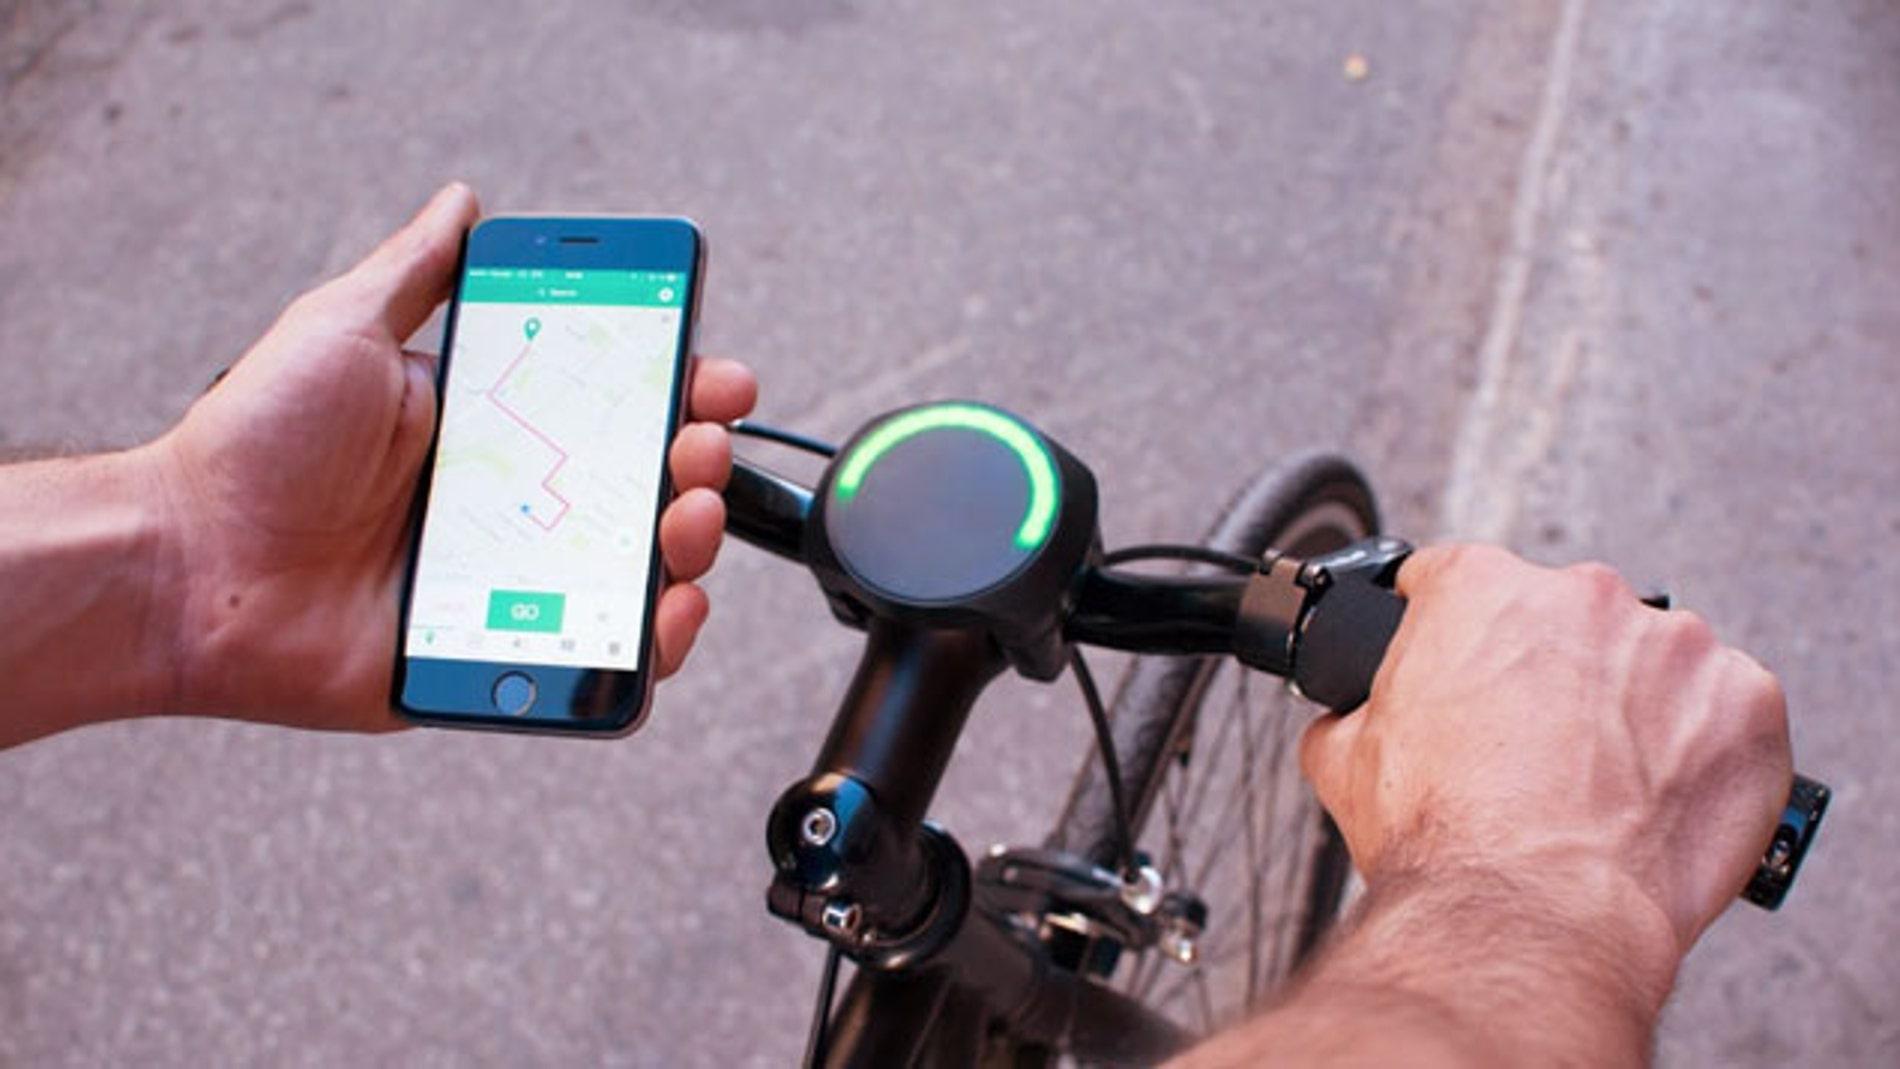 Minicerebro para bicicletas inteligentes